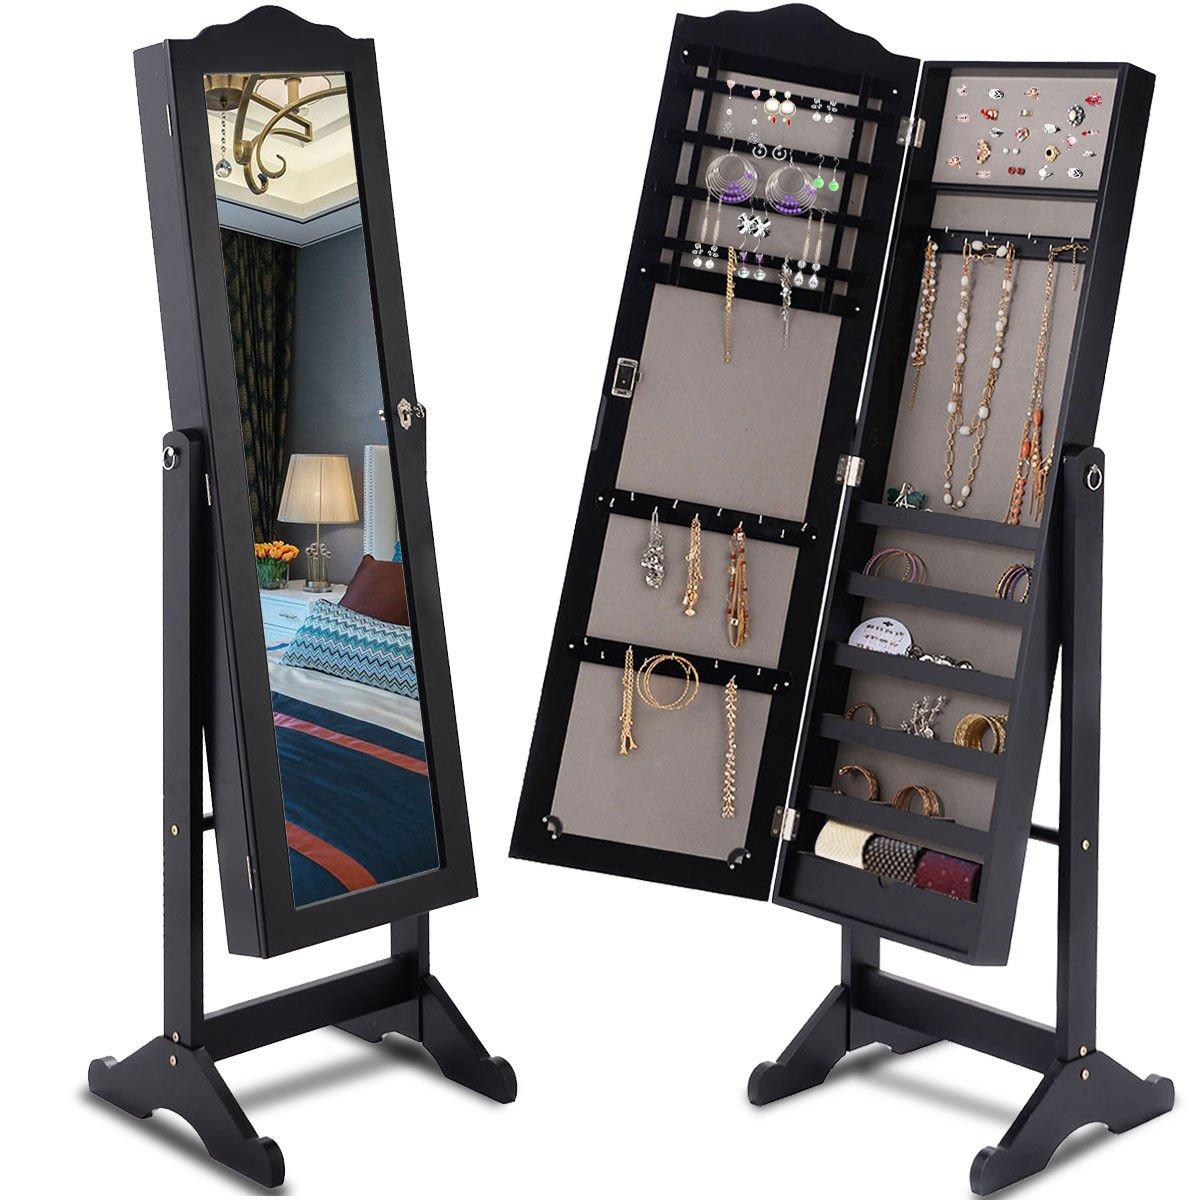 Giantex Lockable Mirrored Jewelry Cabinet Armoire Mirror Organizer Storage Box w/Stand (Black)